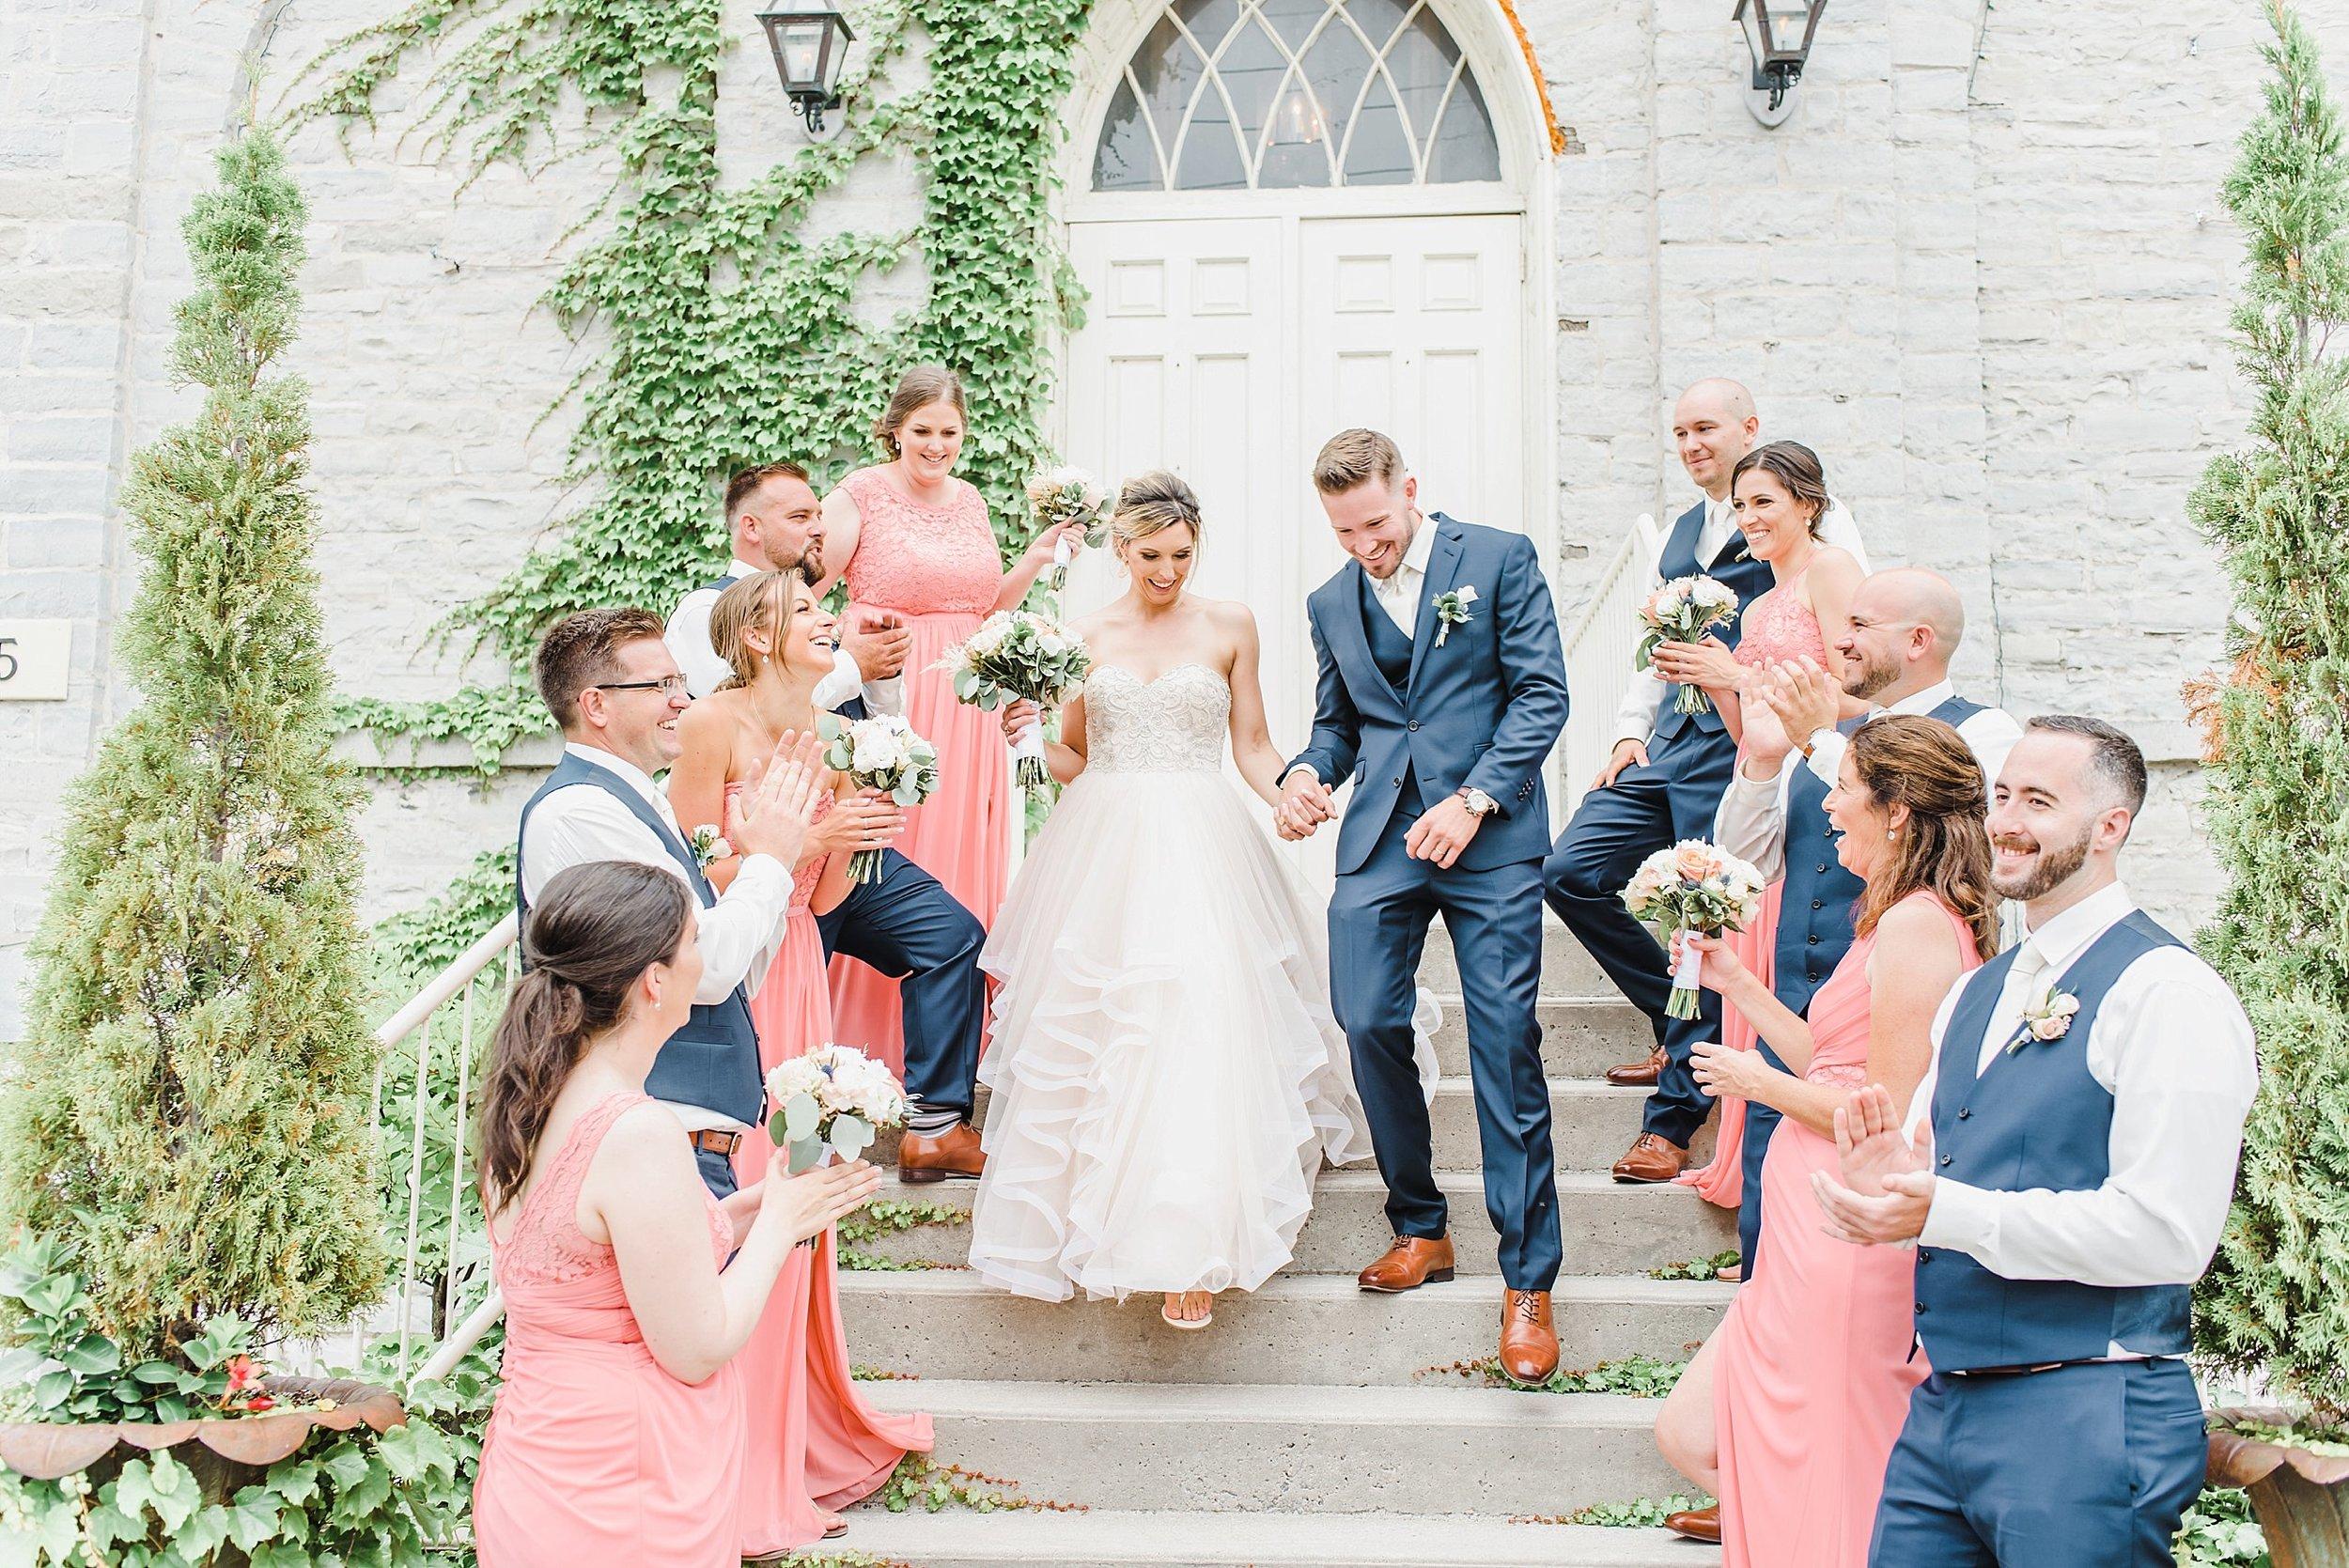 light airy indie fine art ottawa wedding photographer | Ali and Batoul Photography_0199.jpg